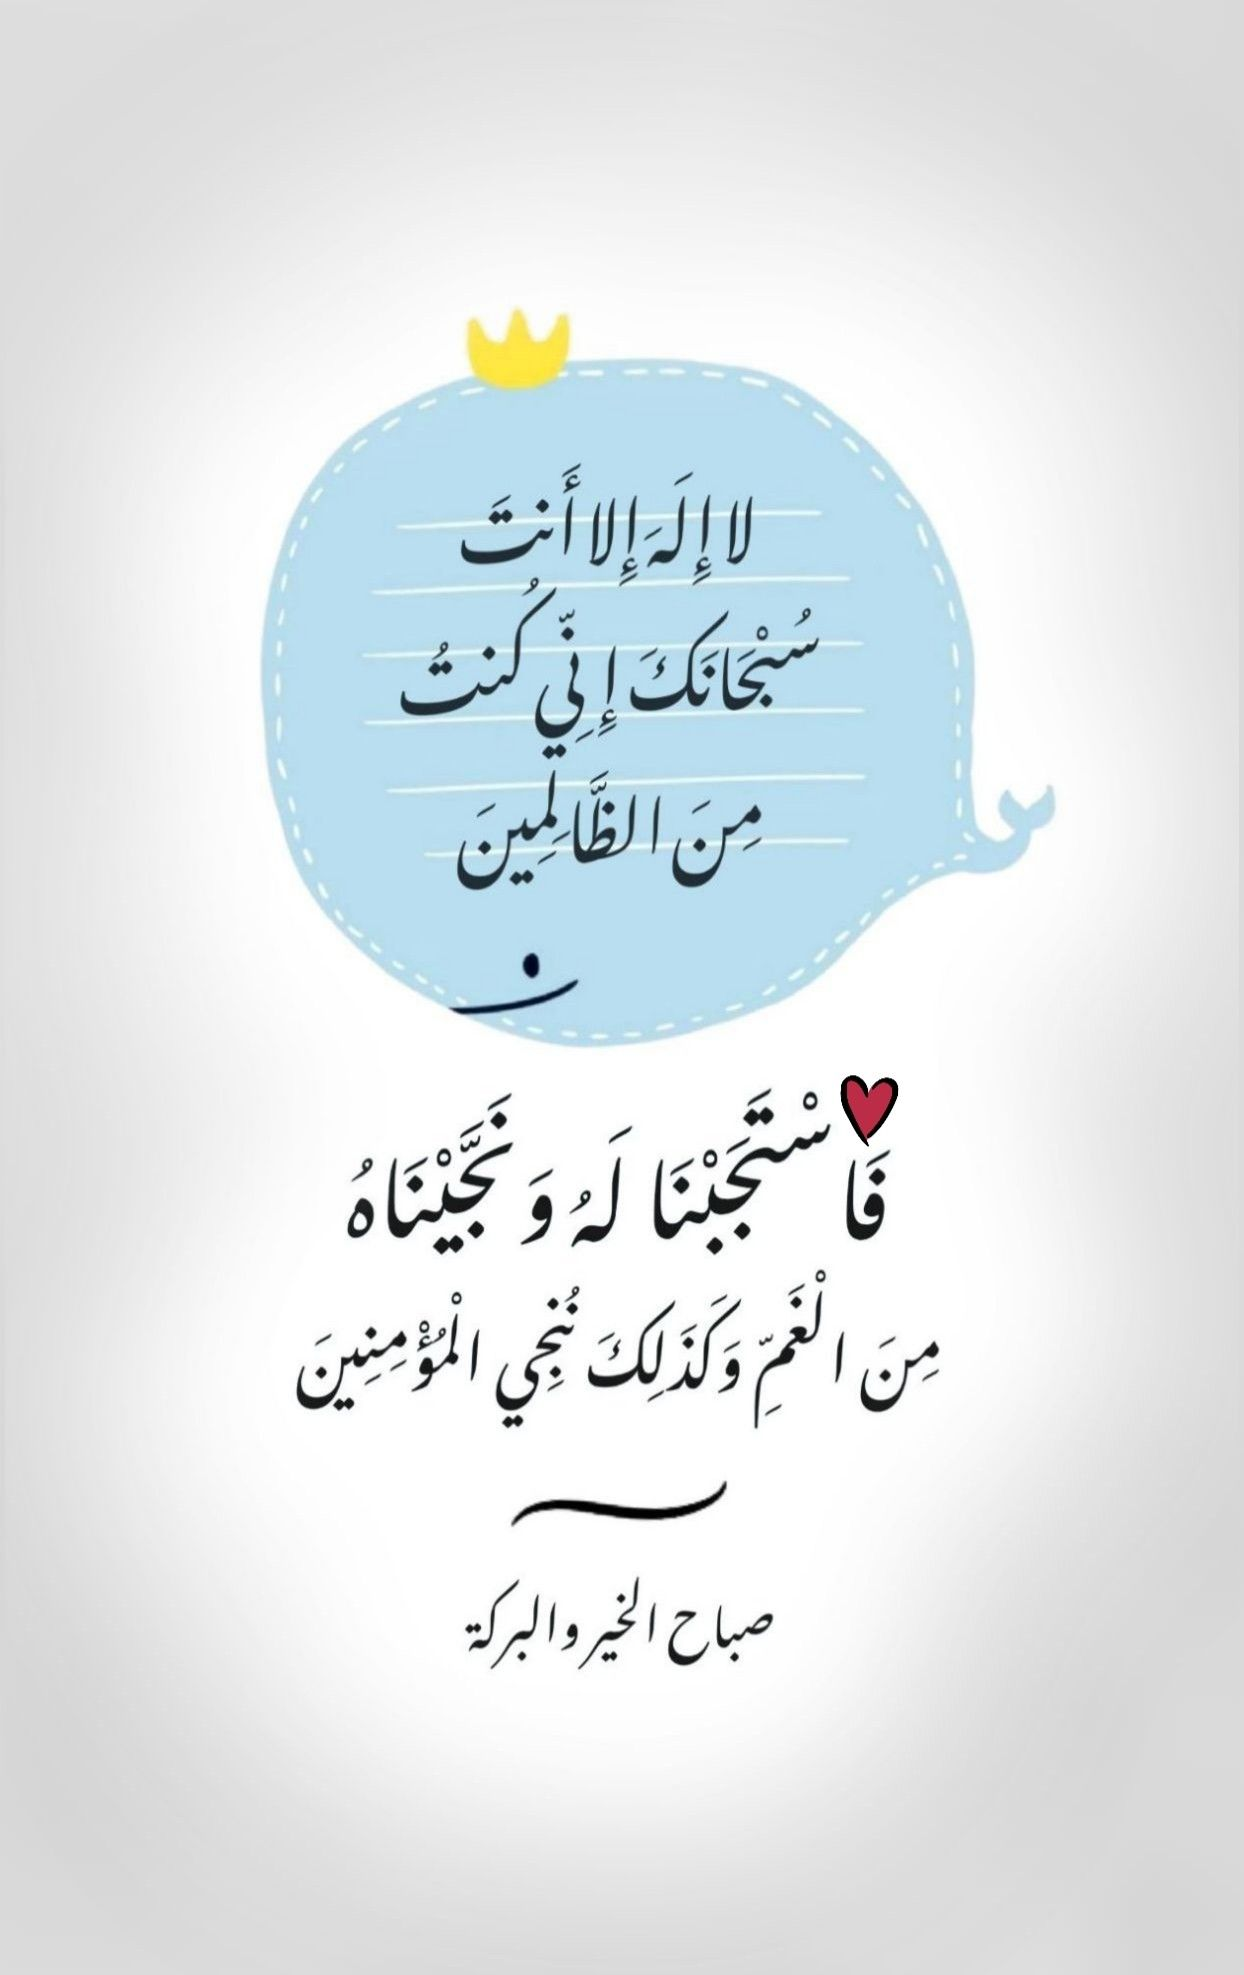 لا إ ل ه إ لا أ نت س ب ح ان ك إ ن ي ك نت م ن الظ ال م ين ف اس ت ج ب ن ا ل ه و ن ج Good Morning Arabic Islamic Quotes Wallpaper Good Morning Greetings